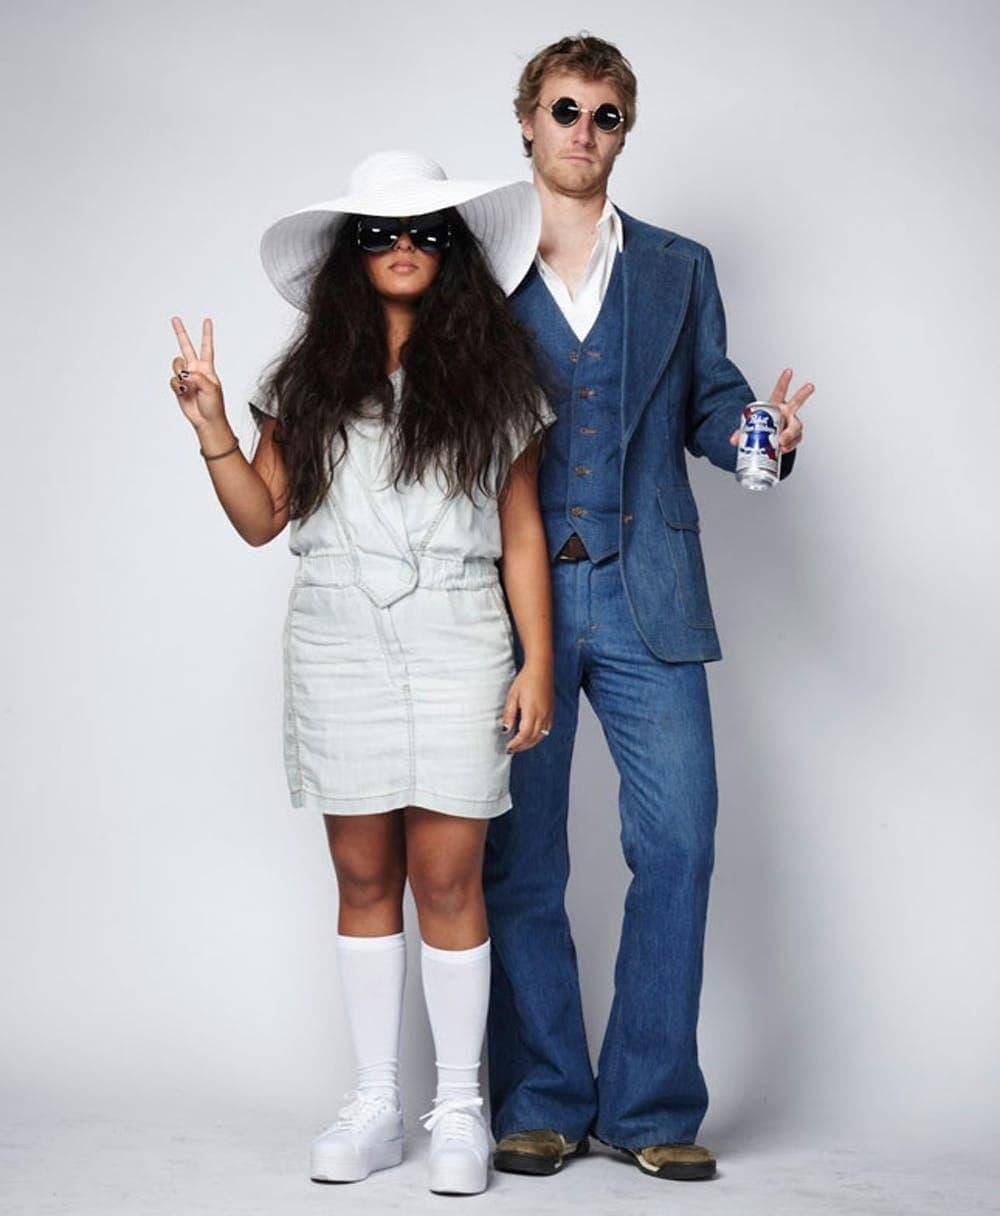 Man and Woman in DIY Couples costume: John Lennon and Yoko Ono